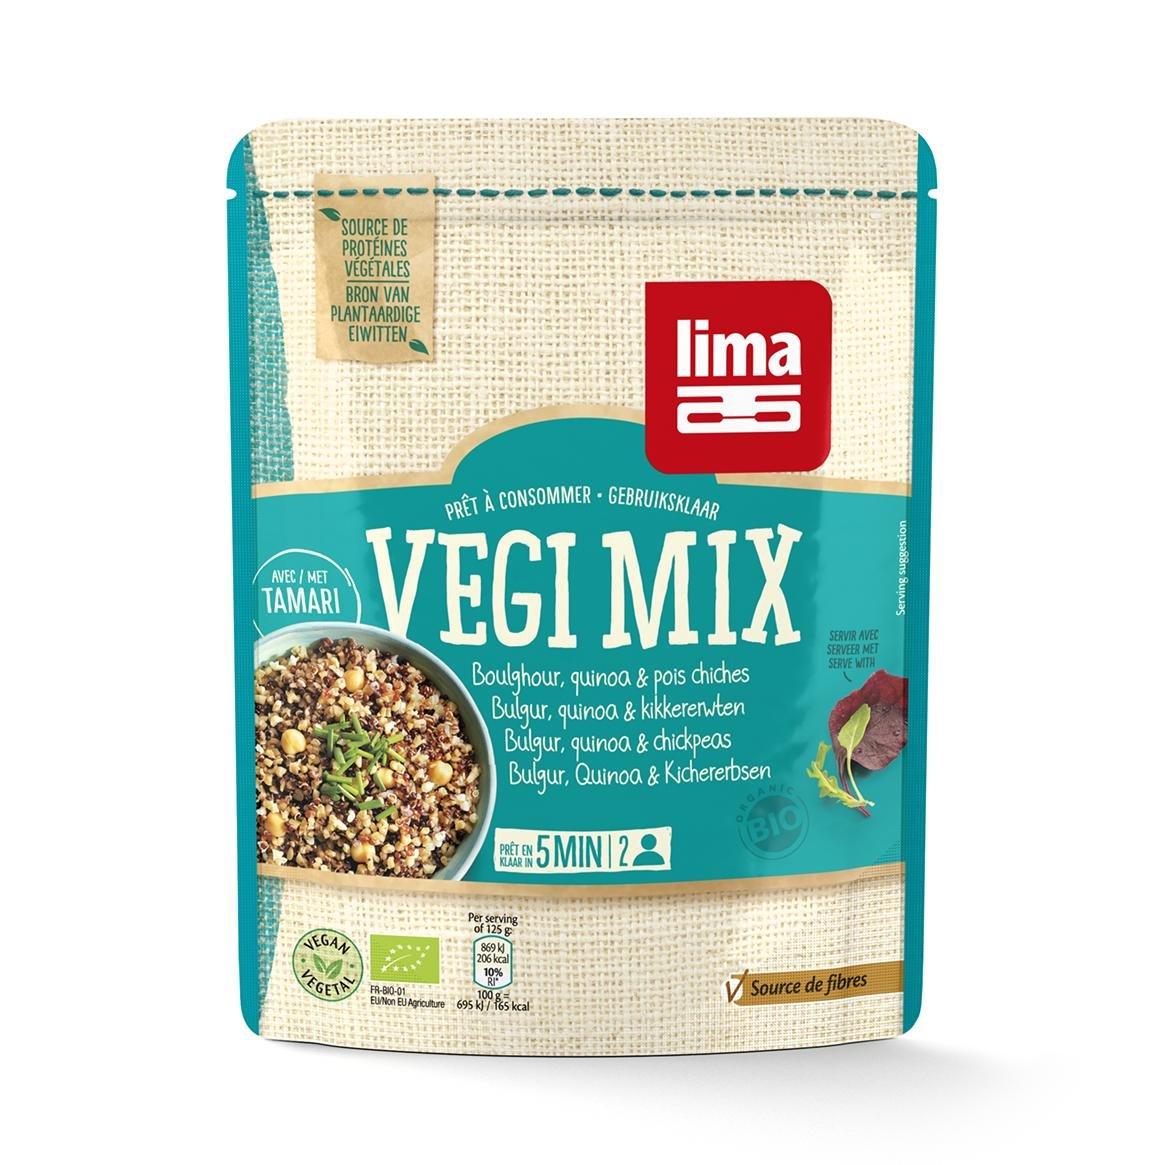 Bulgur, Quinoa y Garbanzos Vegi Mix Lima, 250 g: Amazon.es: Hogar